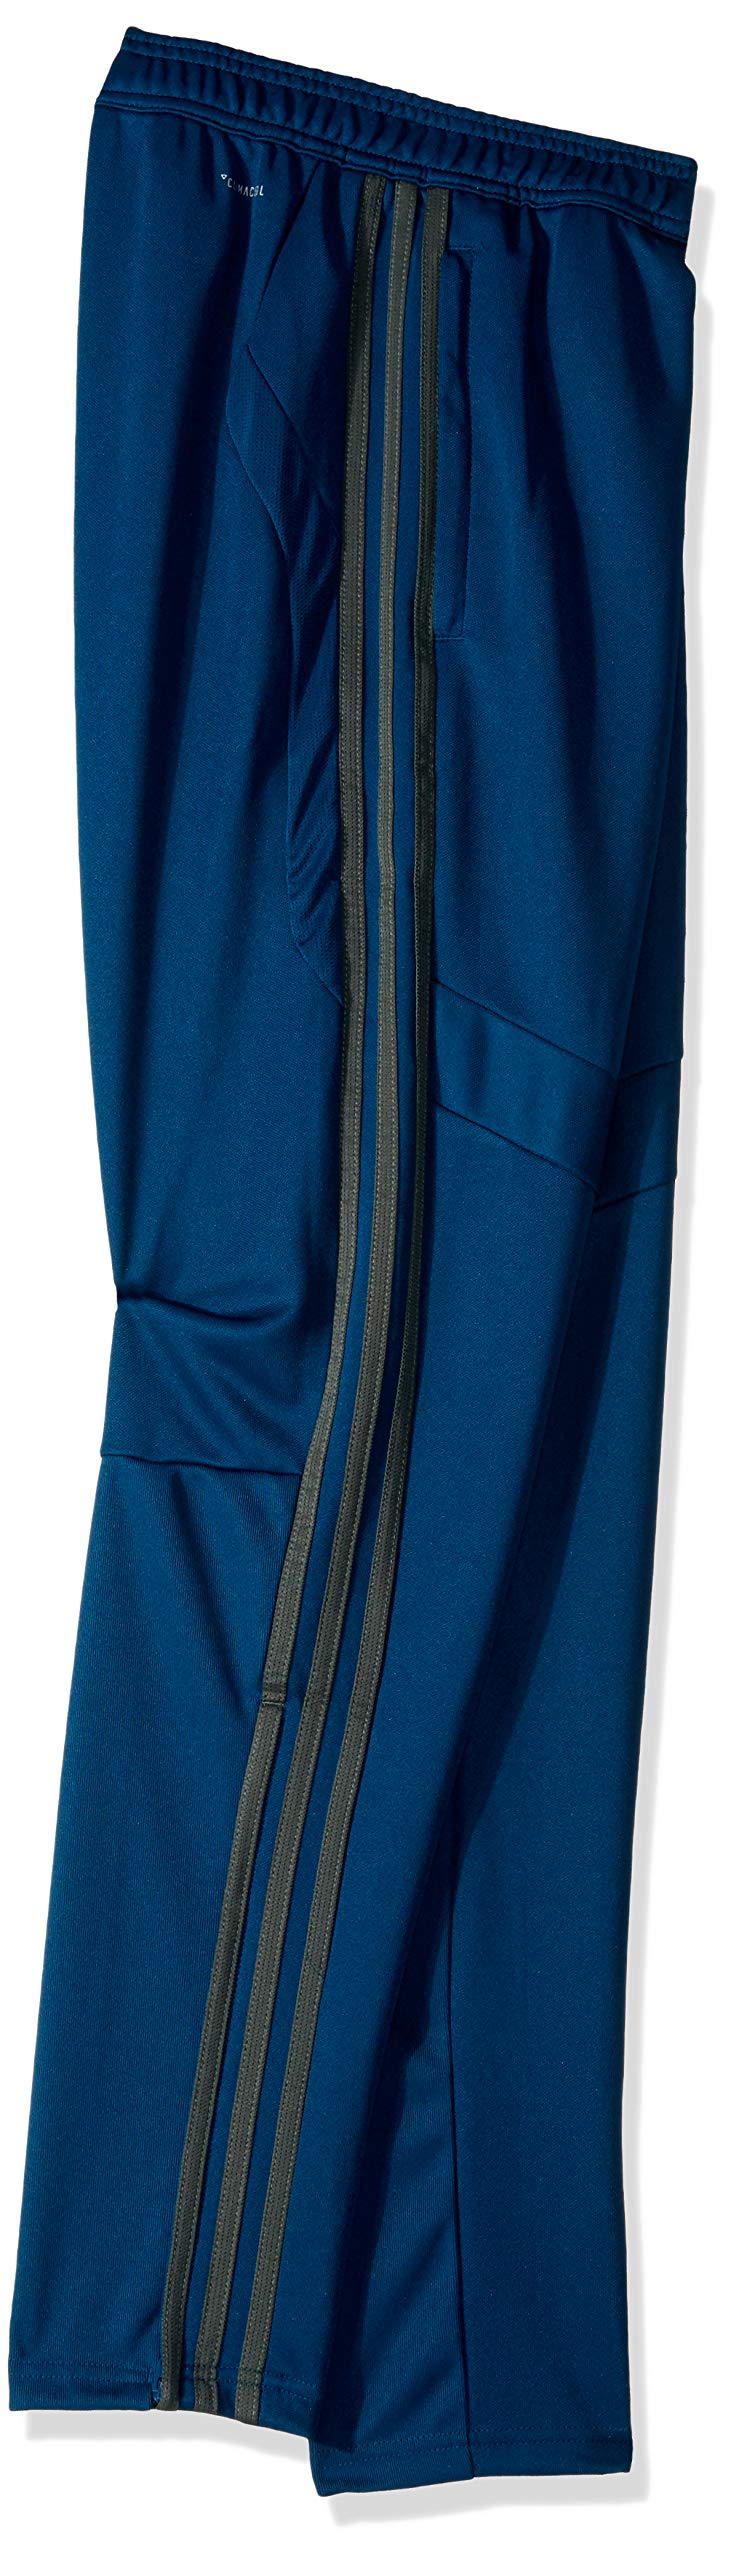 adidas Youth Tiro19 Youth Training Pants, Legend Marine/Legend Ivy, XX-Small by adidas (Image #3)